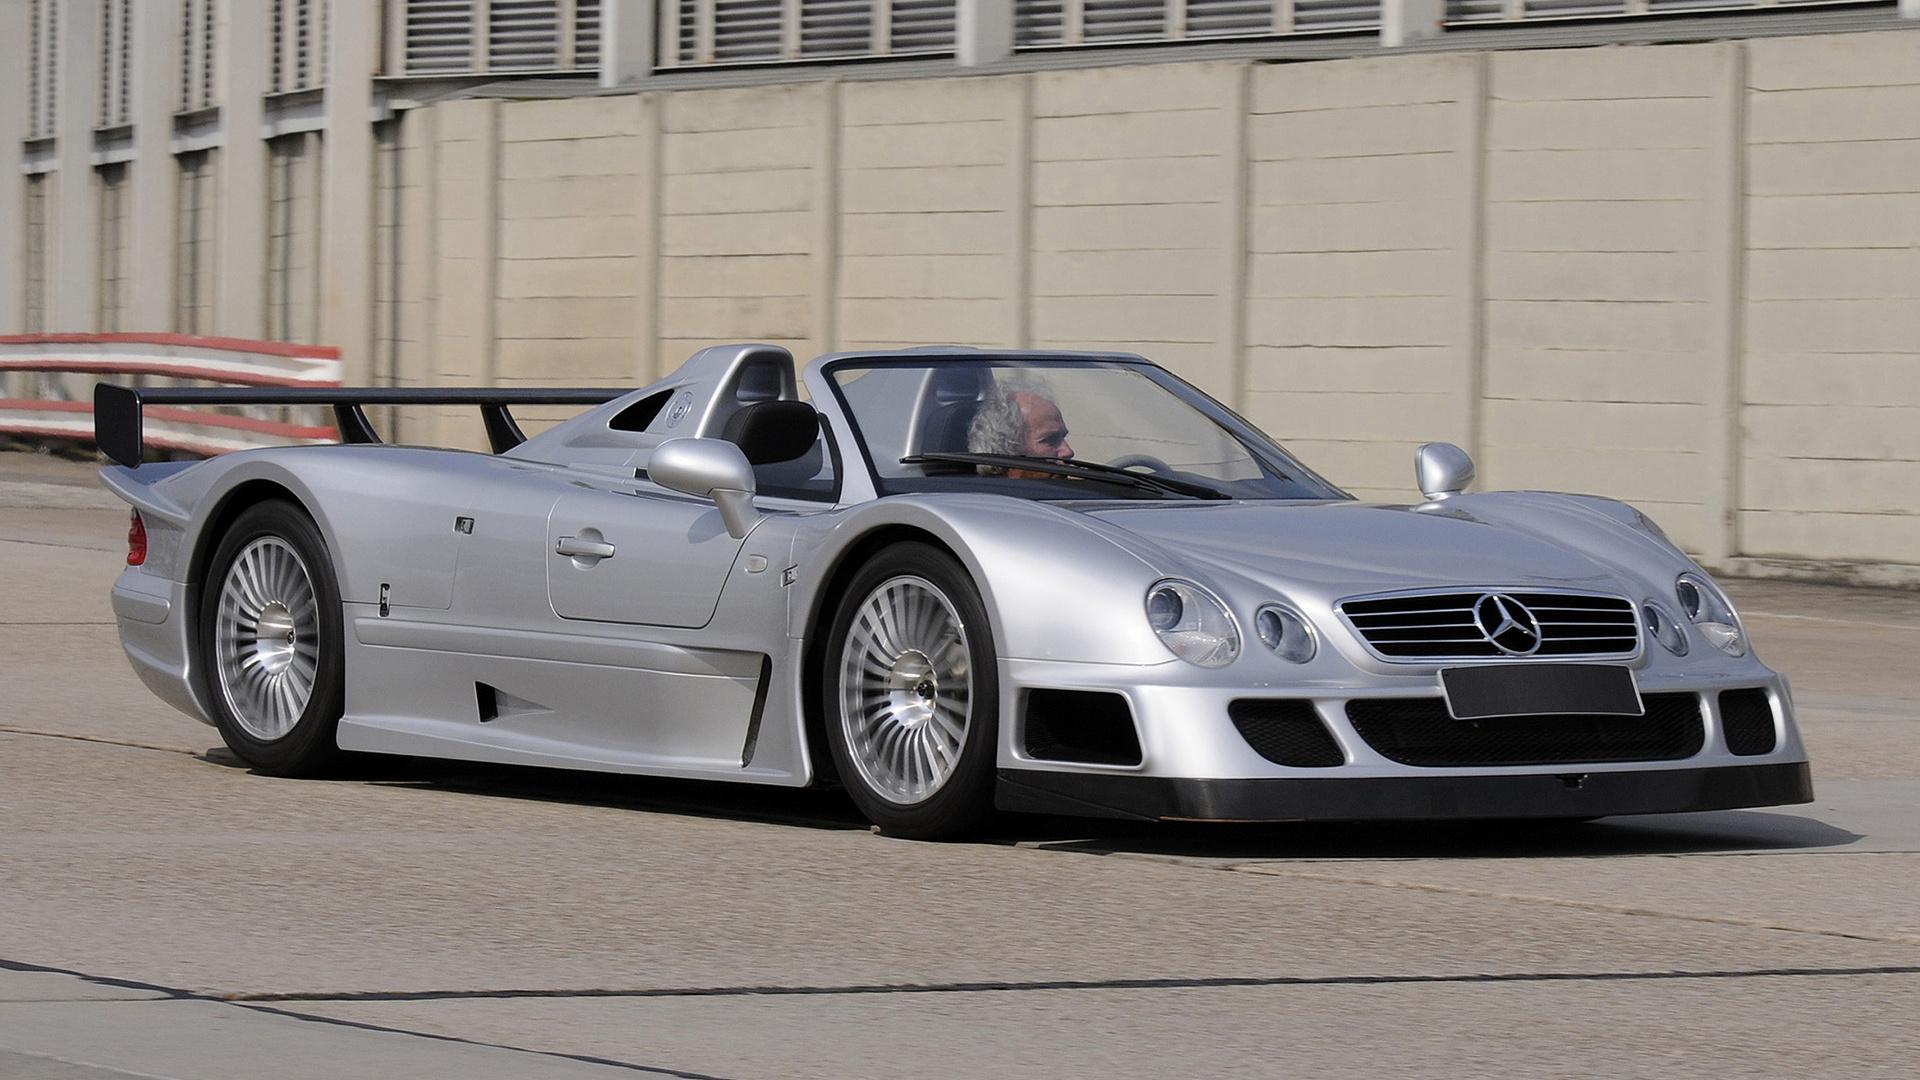 Mercedes Amg Gtr >> 1998 Mercedes-Benz CLK GTR Roadster - Wallpapers and HD Images | Car Pixel